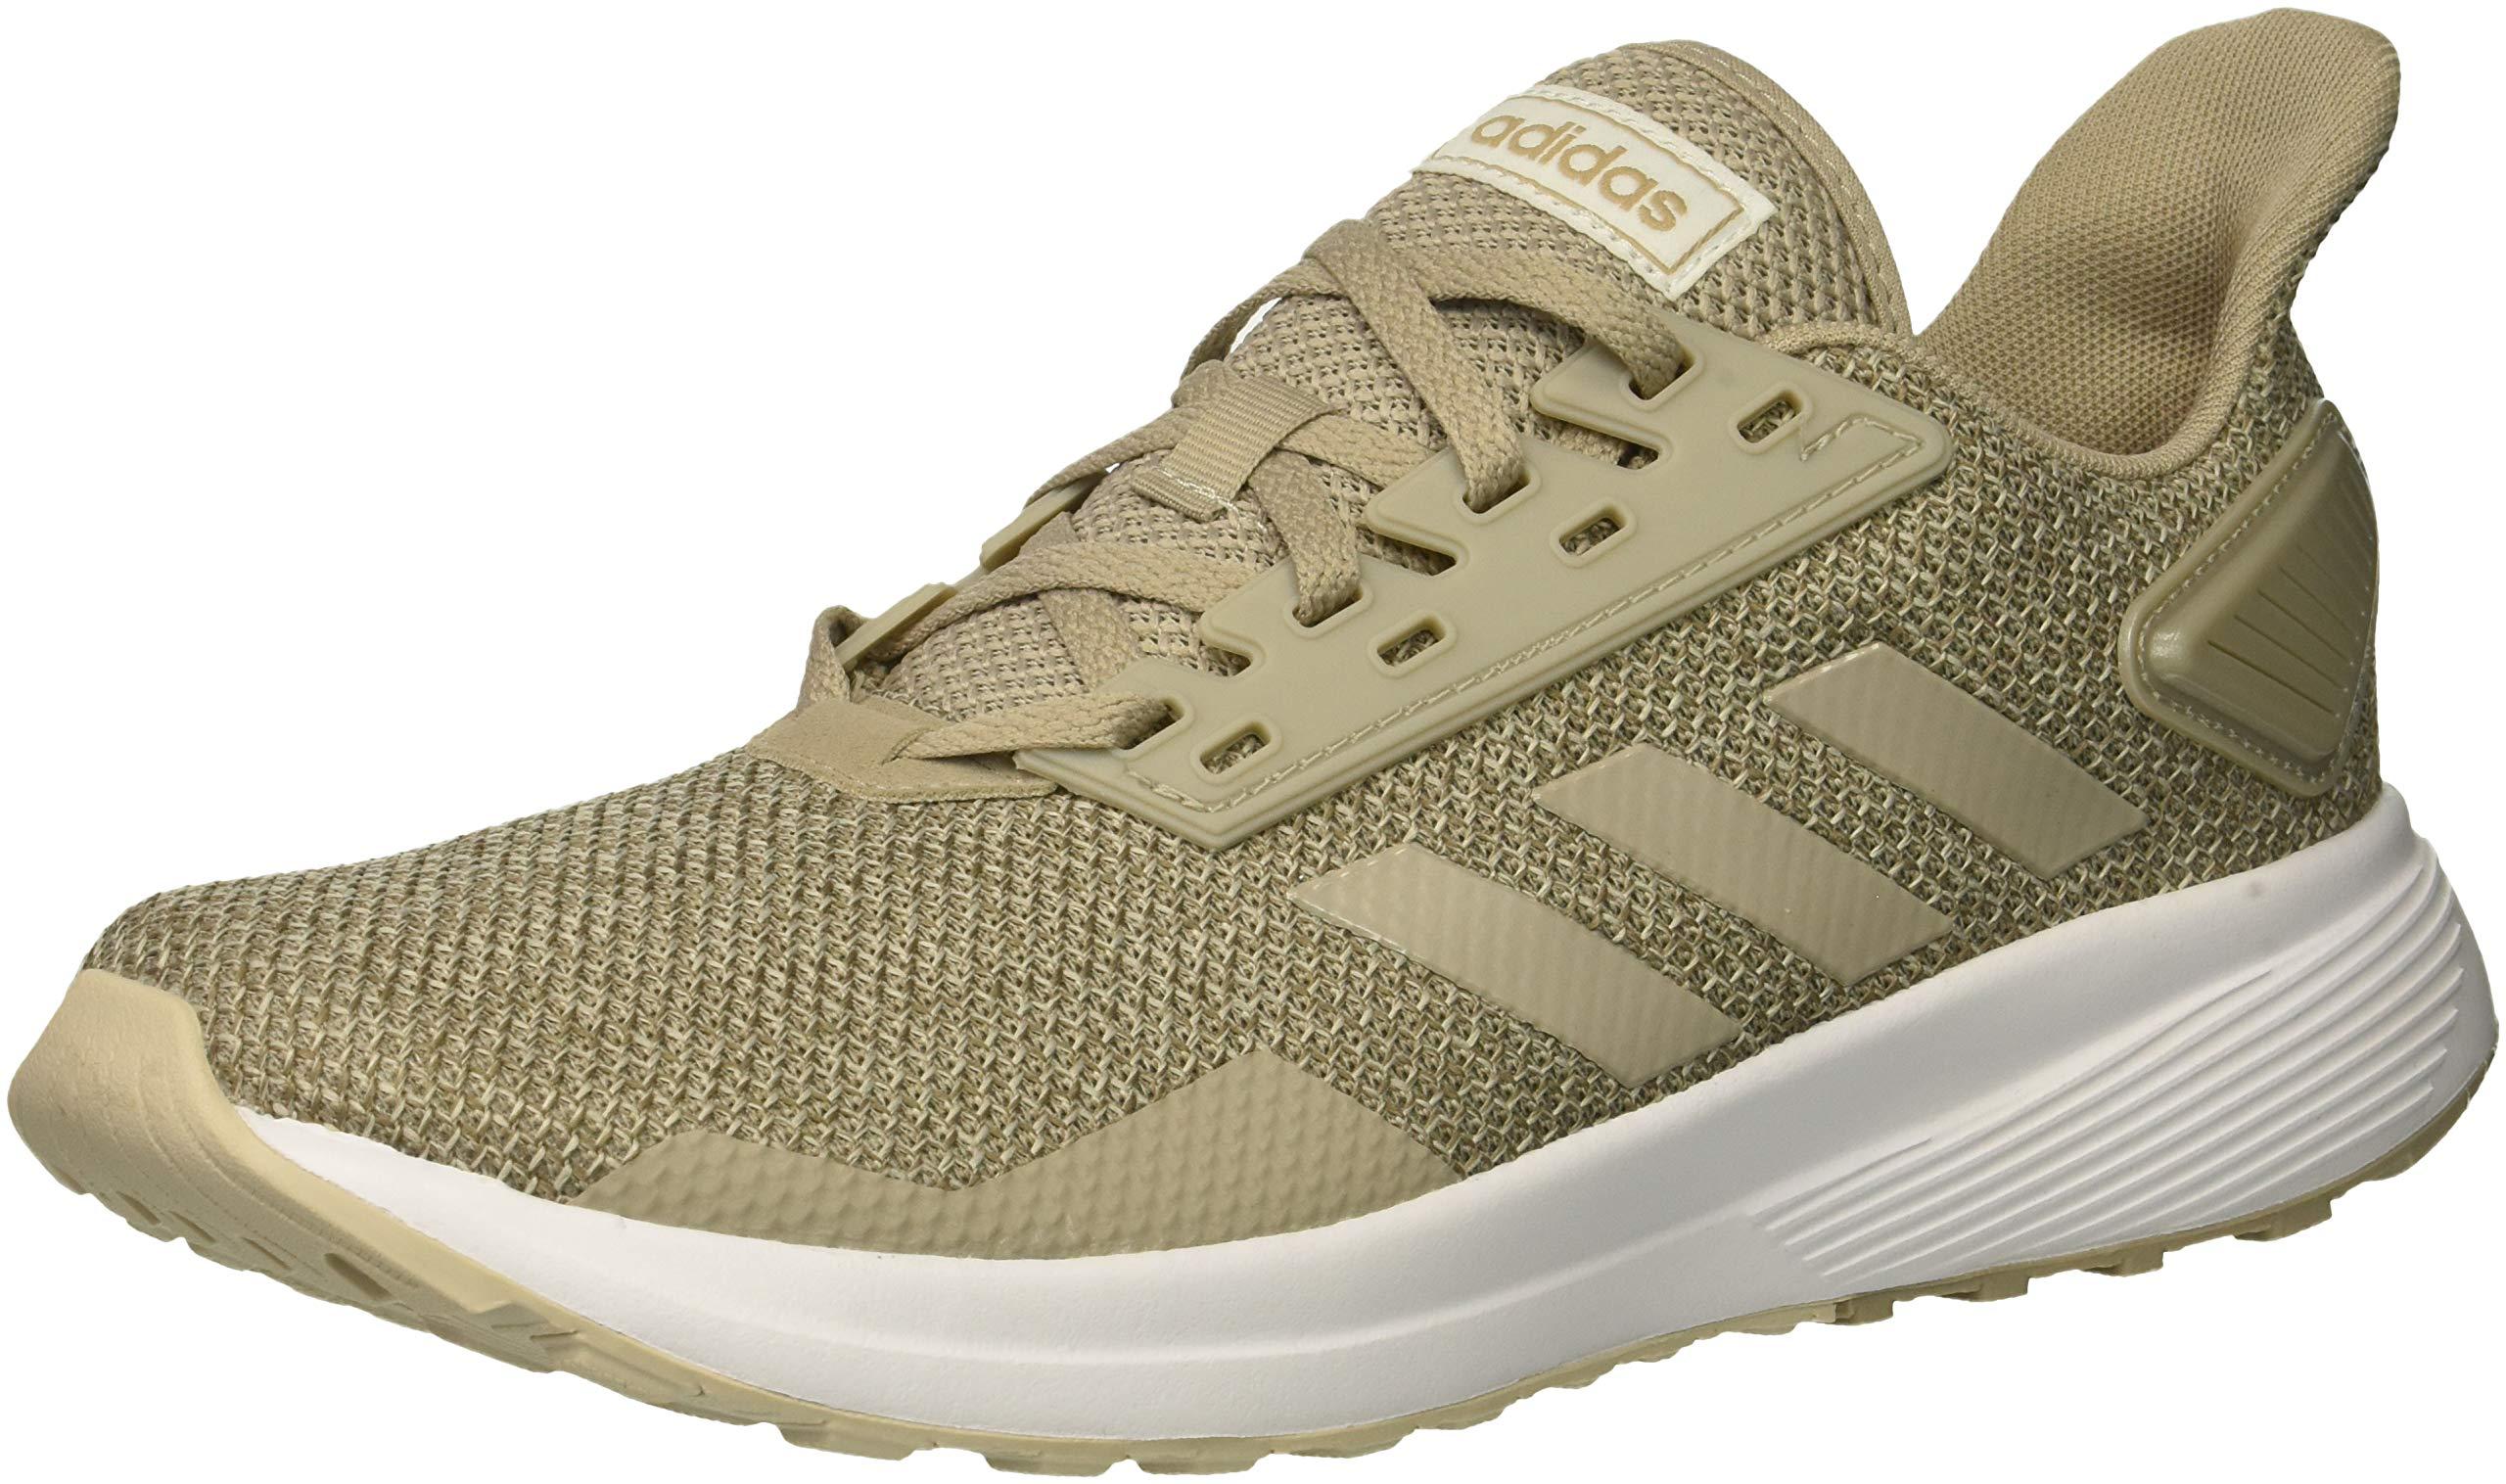 adidas Women's Duramo 9 Running Shoe, Light Brown/Light Brown/Clear Brown, 7 M US by adidas